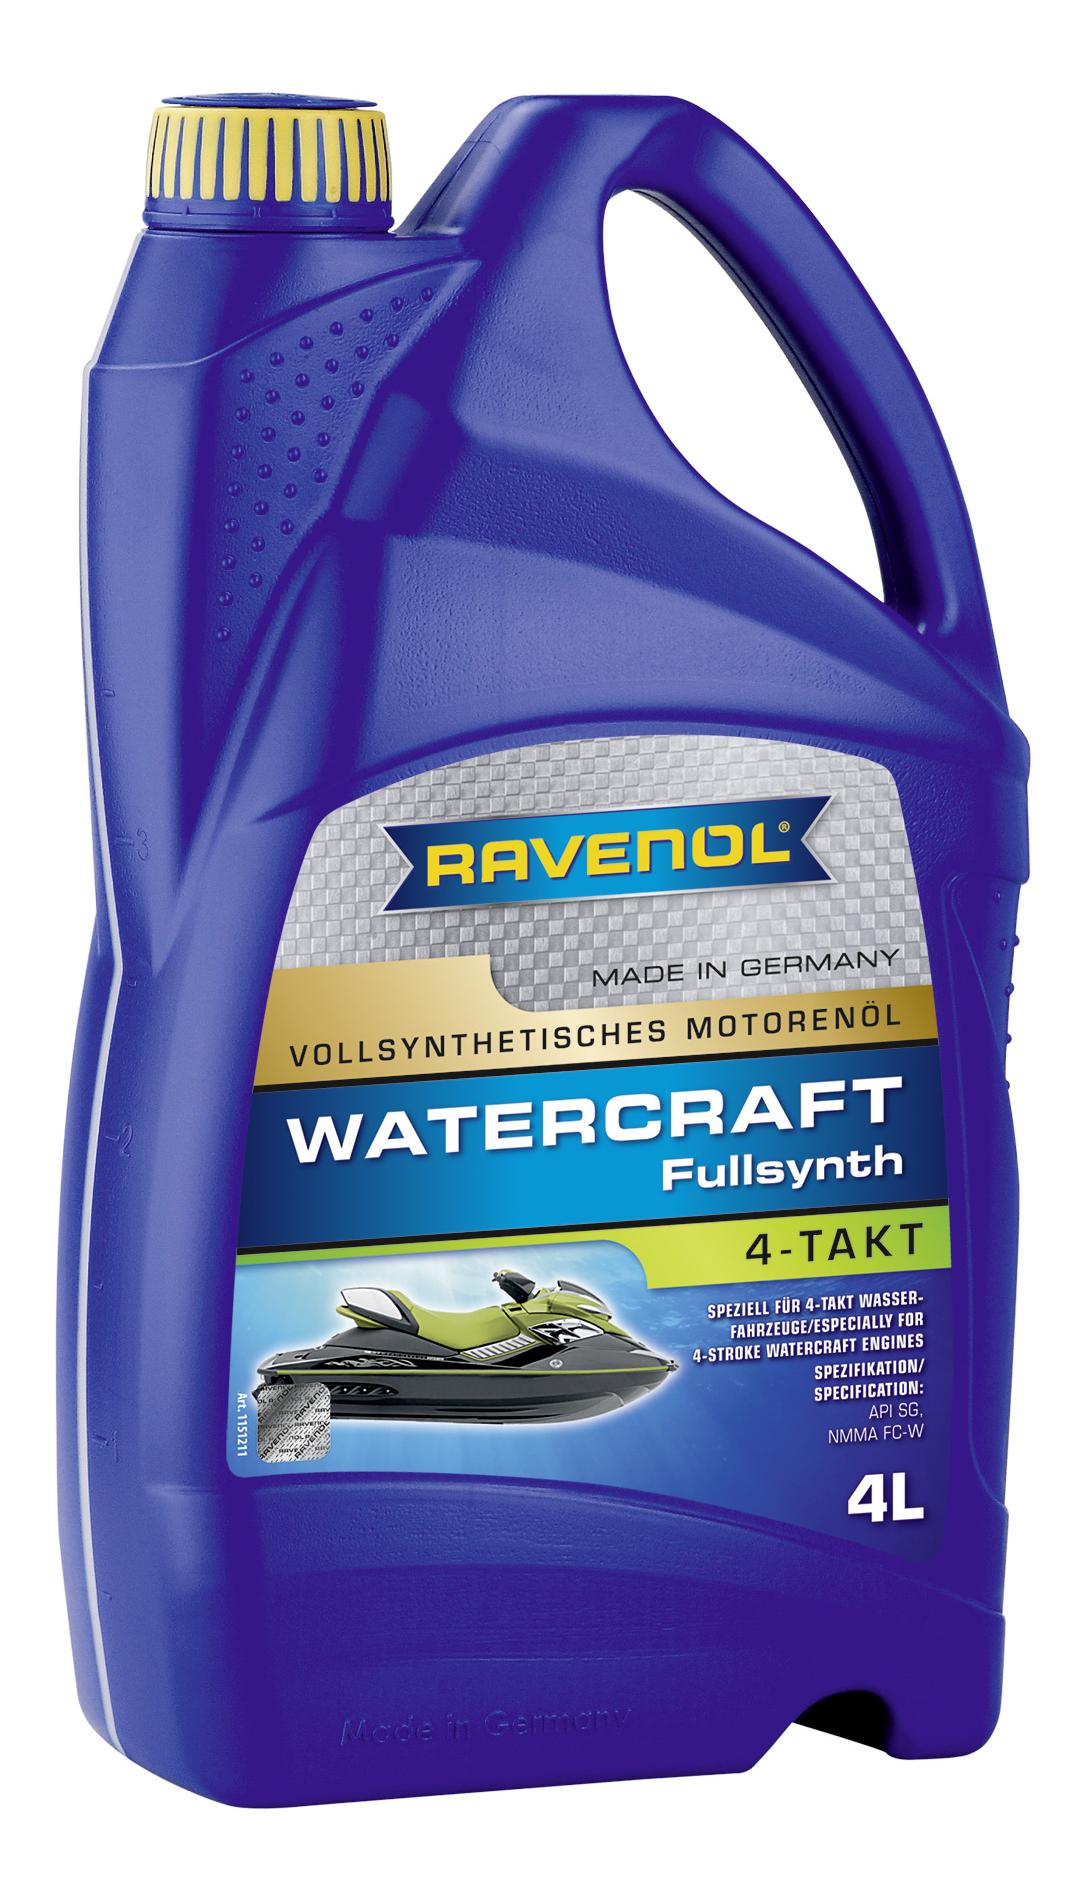 Моторное масло Ravenol Watercraft 4-Takt 10W-40 4л